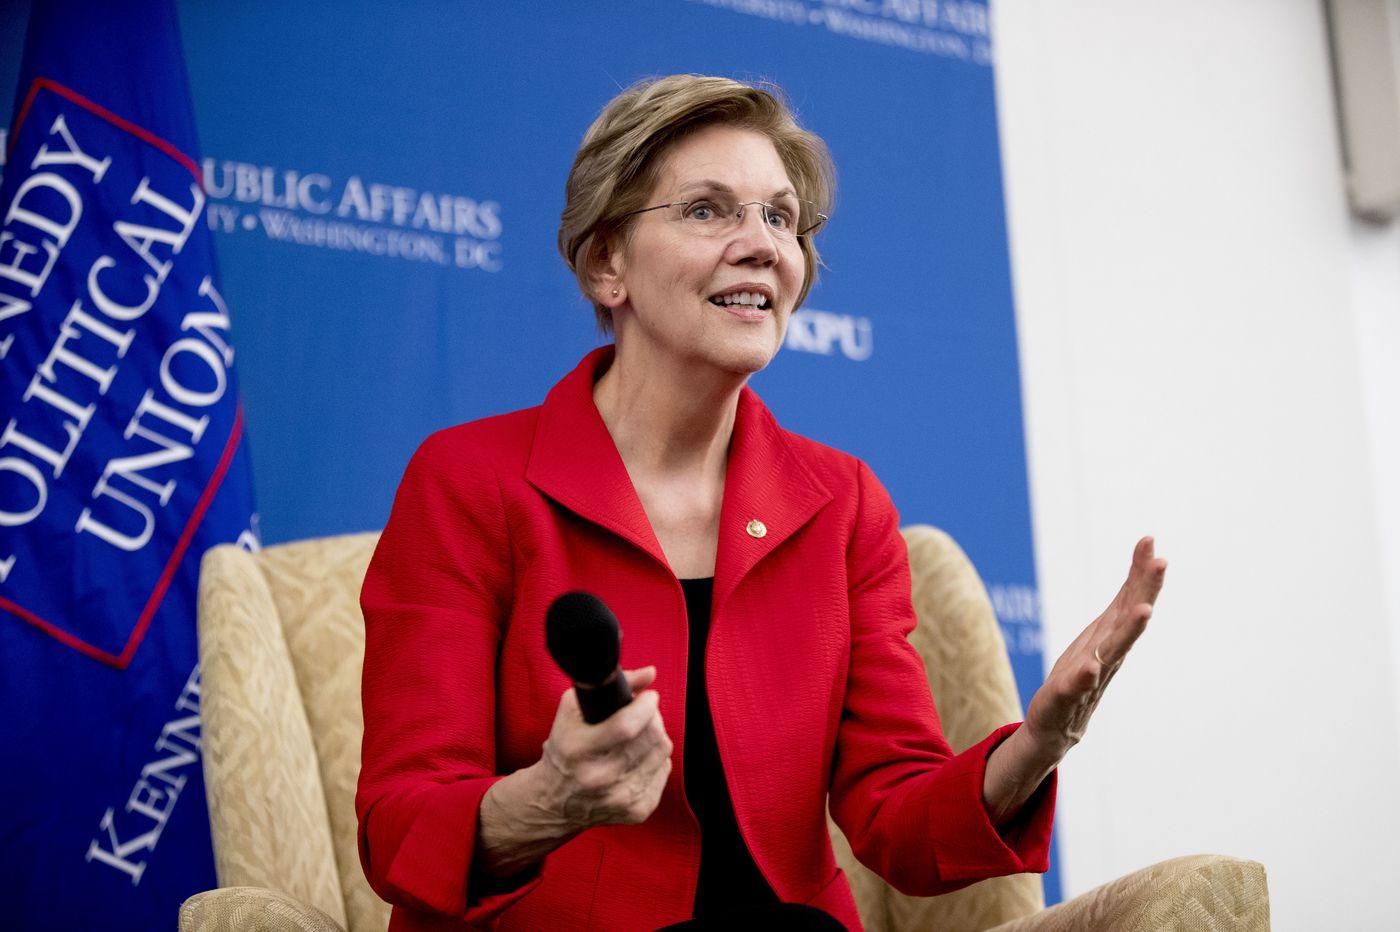 Elizabeth Warren announces exploratory committee for 2020 presidential run